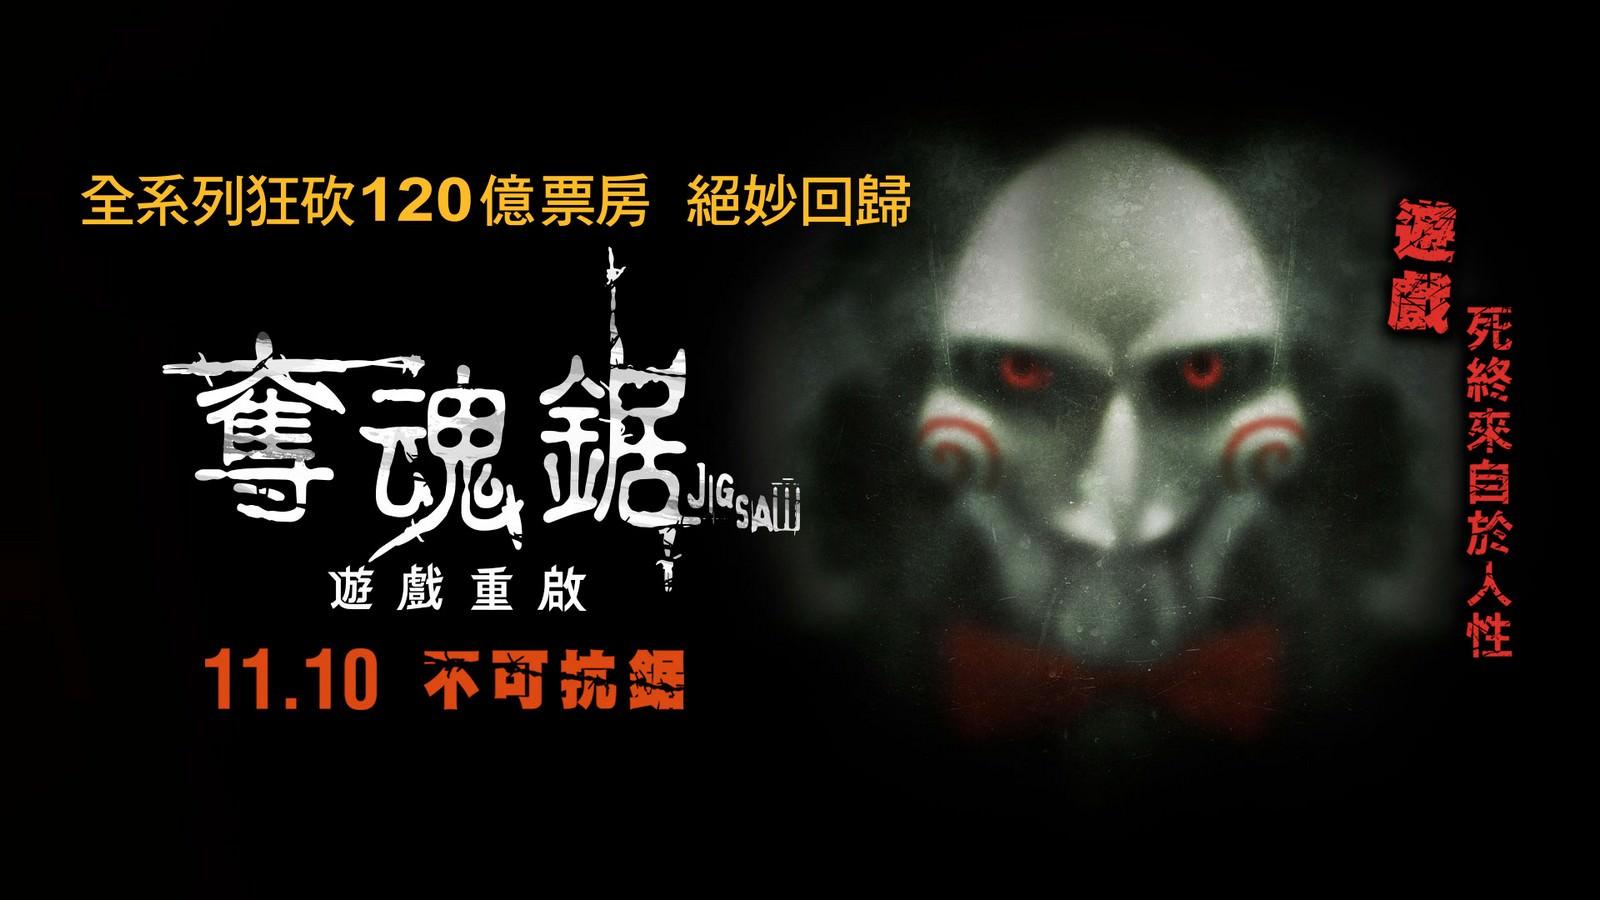 Movie, Jigsaw(美國, 2017) / 奪魂鋸:遊戲重啟(台) / 恐懼鬥室之狂魔再現(港) / 电锯惊魂8:竖锯(網), 電影海報, 台灣, 橫版